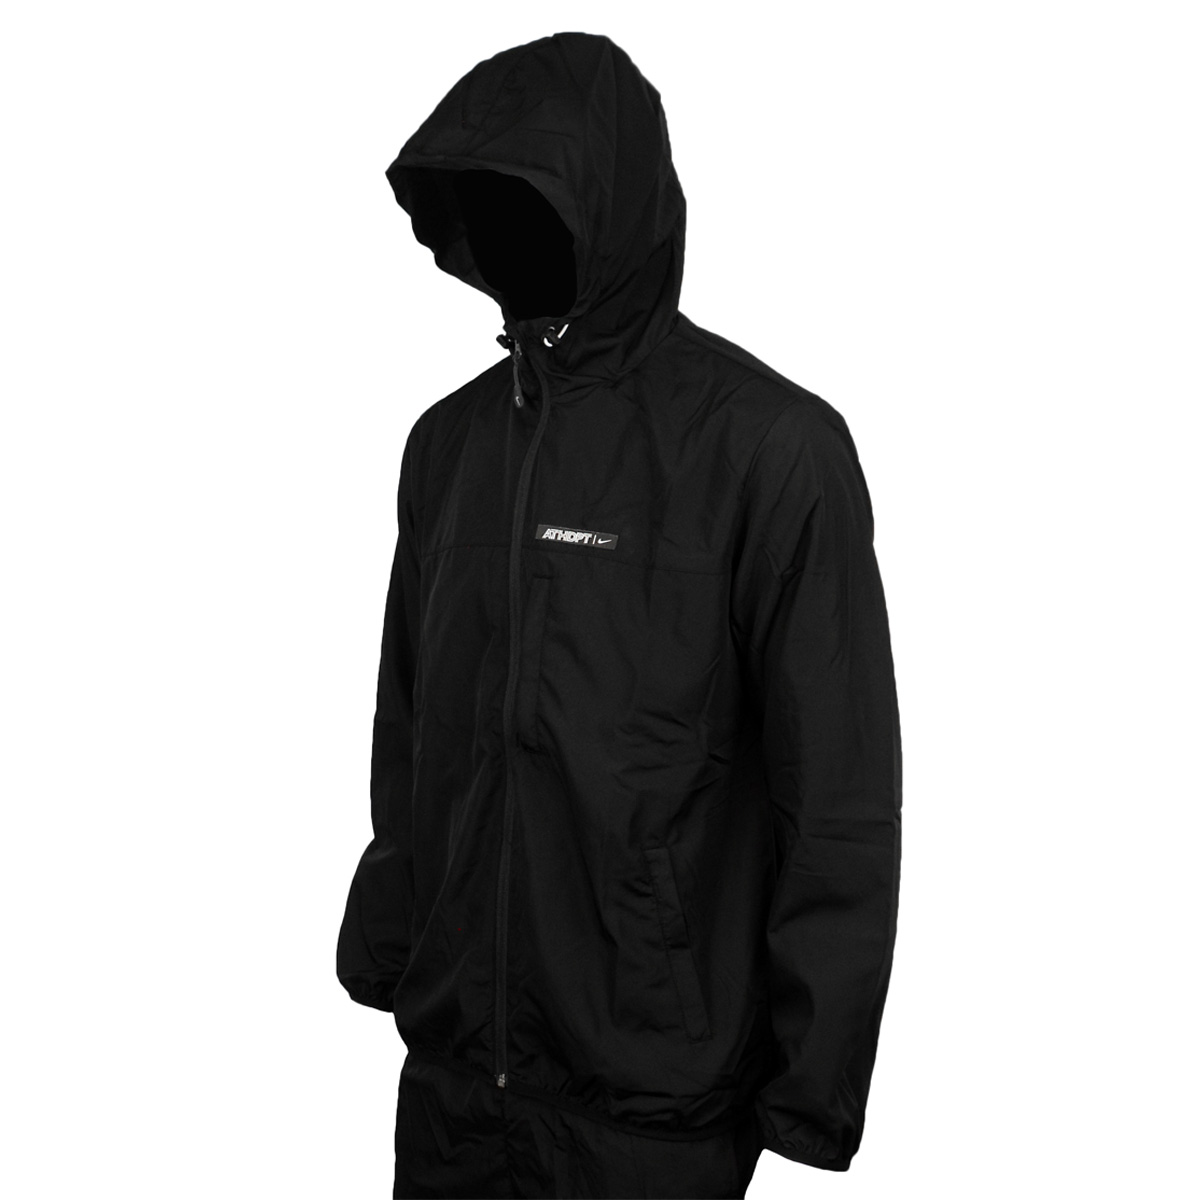 6fc575a4c60b nike black hooded jacket